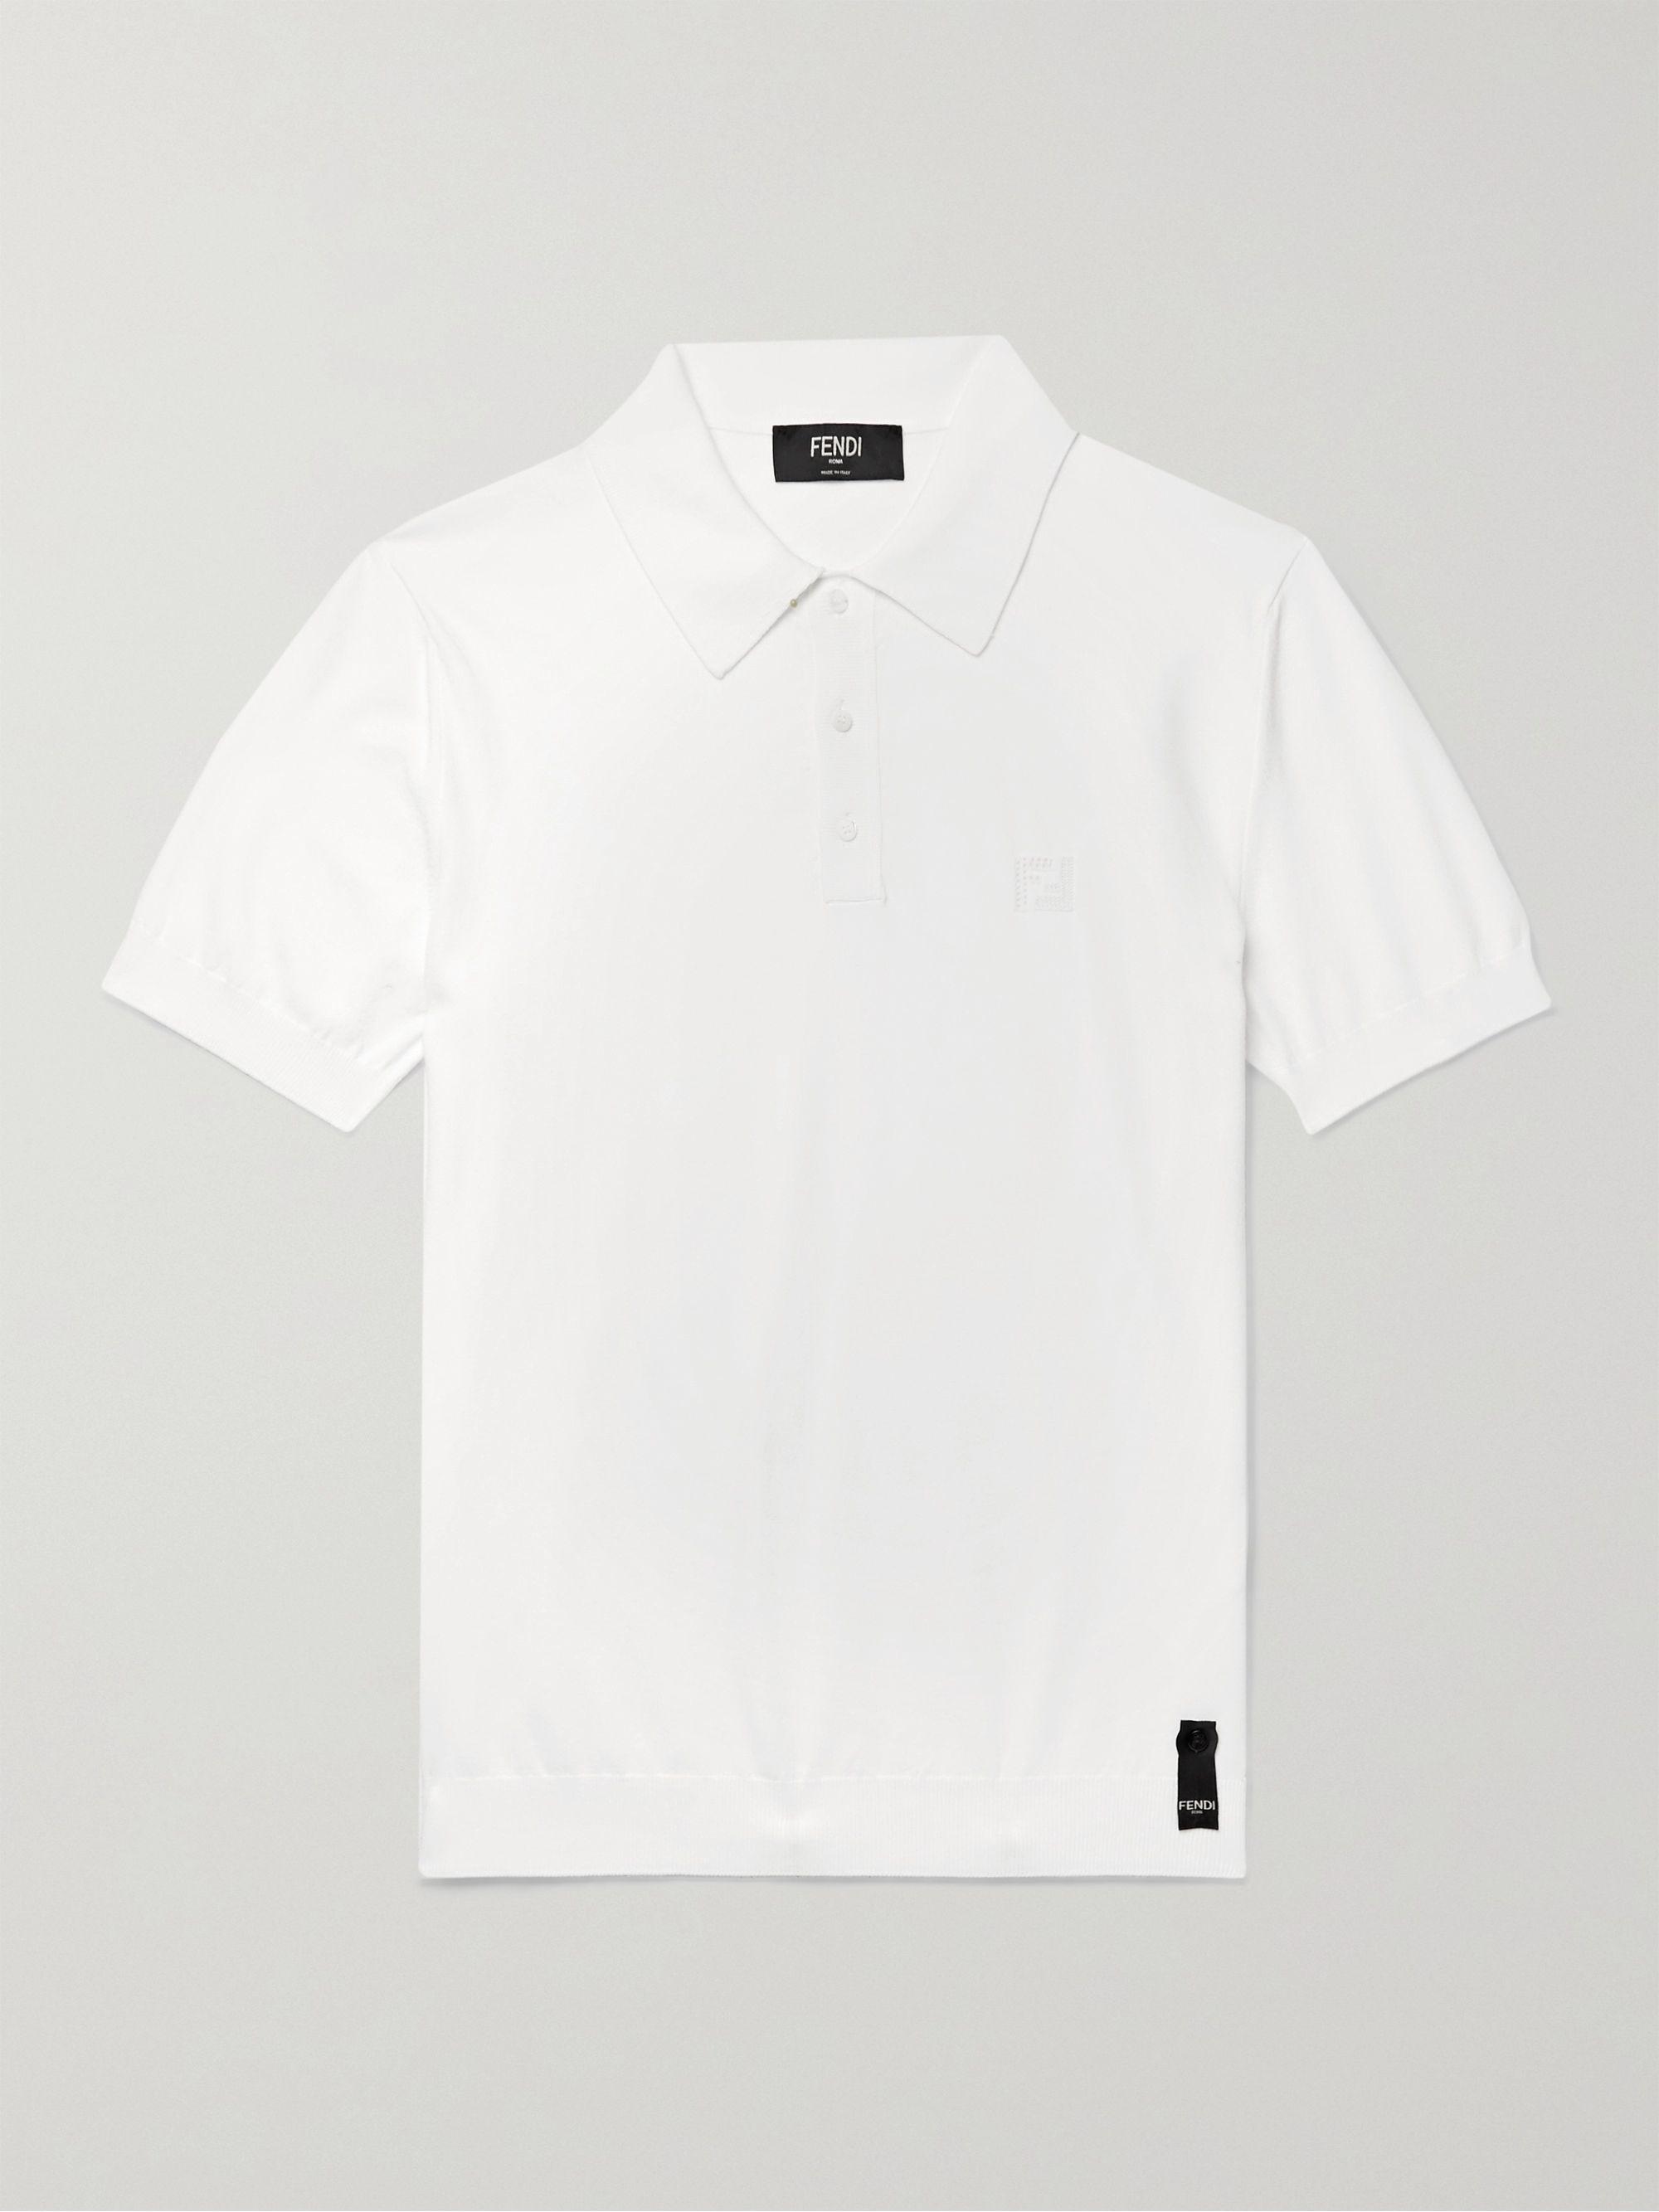 FENDI Knitted Polo Shirt